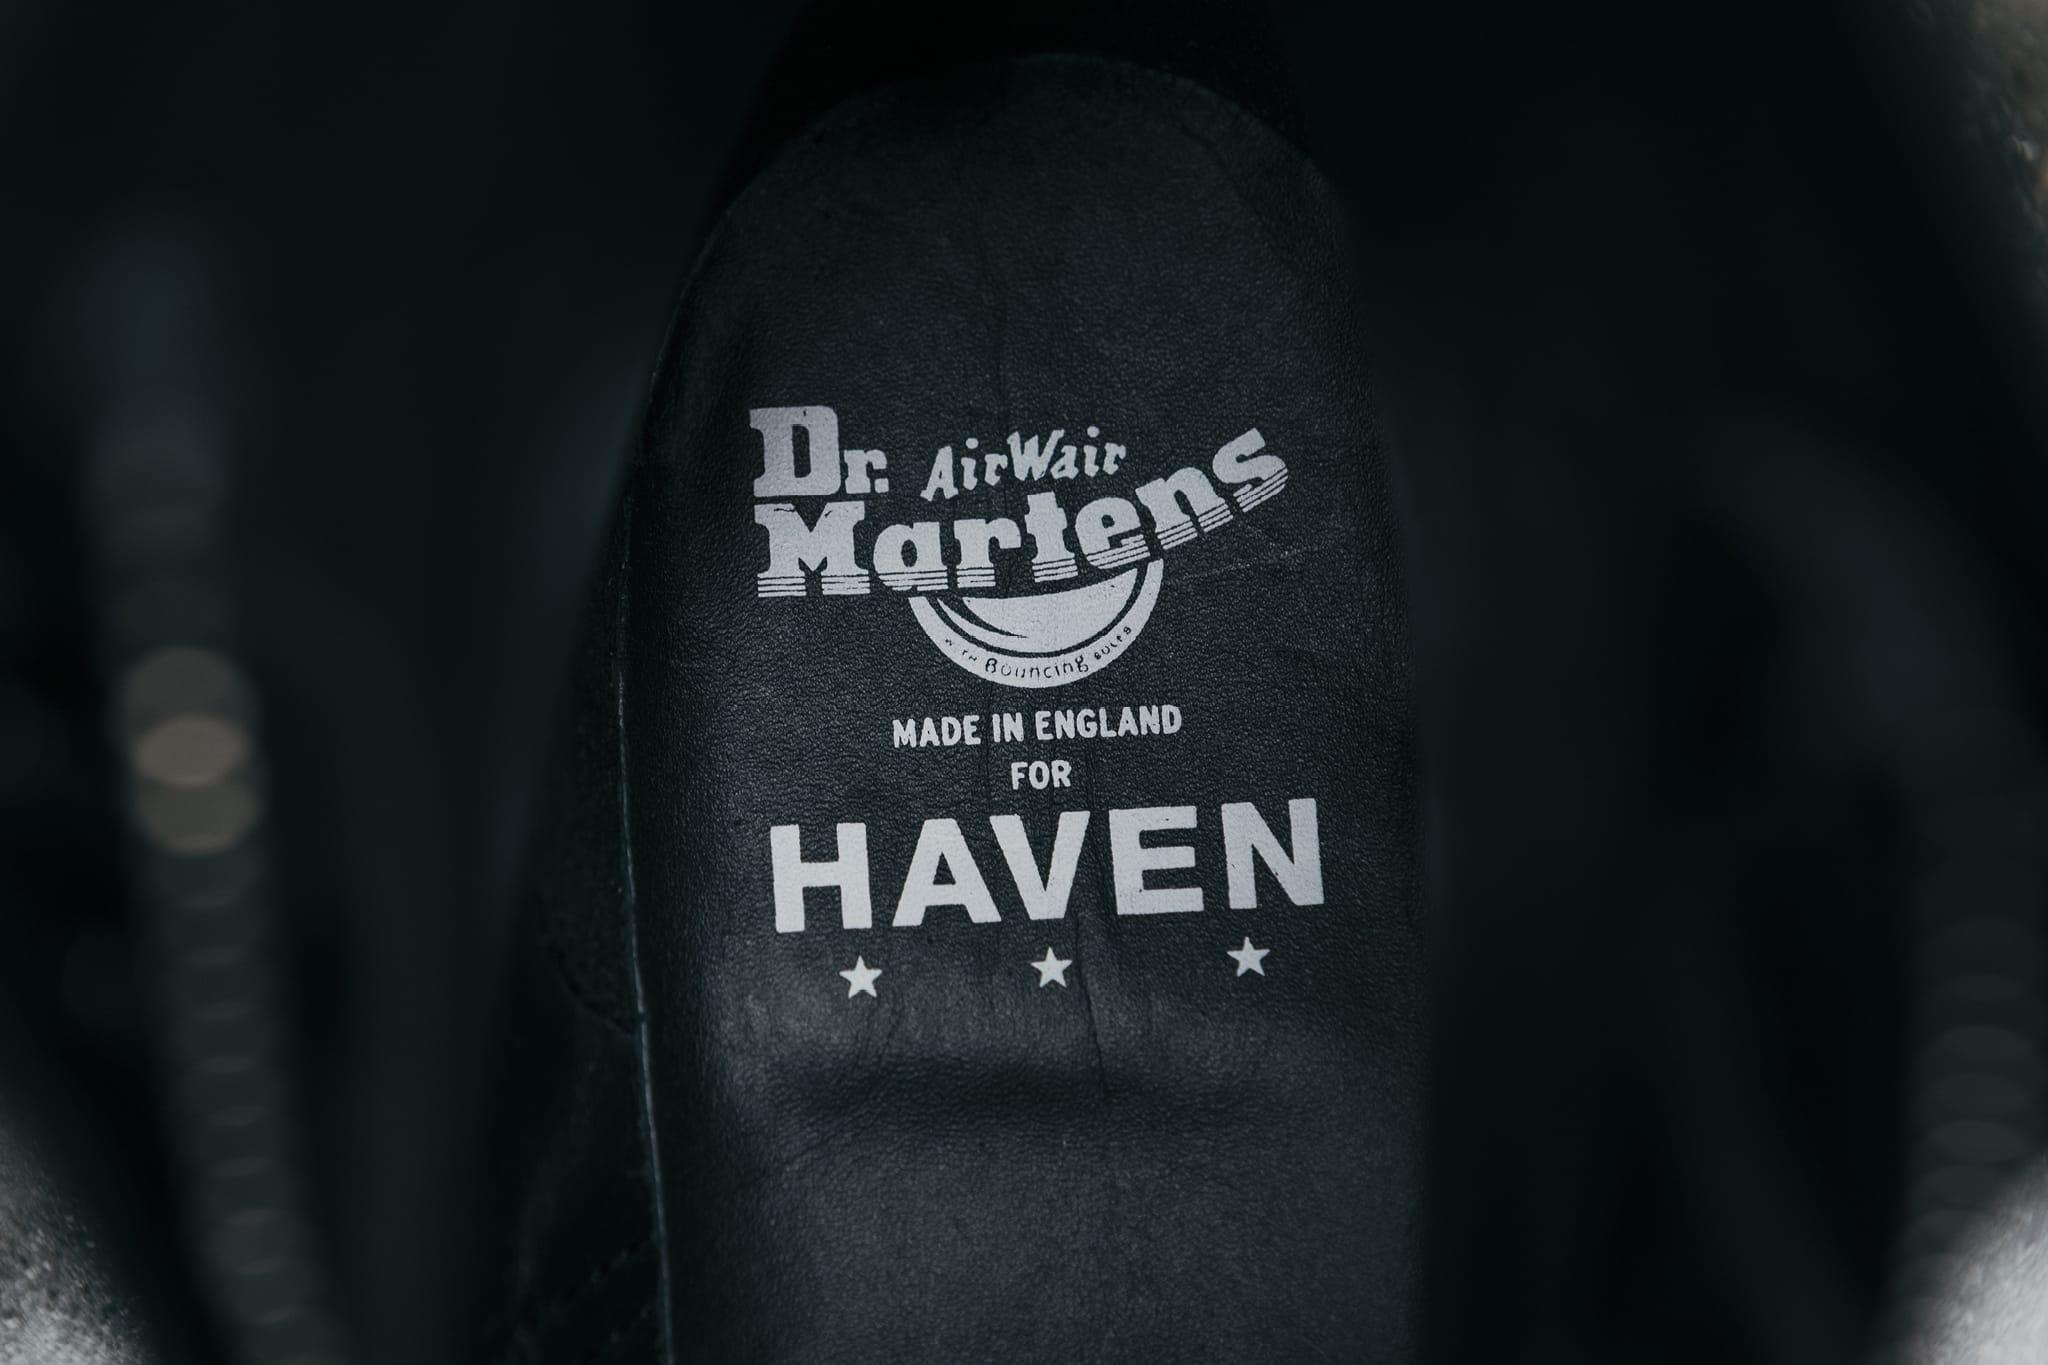 HAVEN Dr. Martens 1460 Jungle Boot